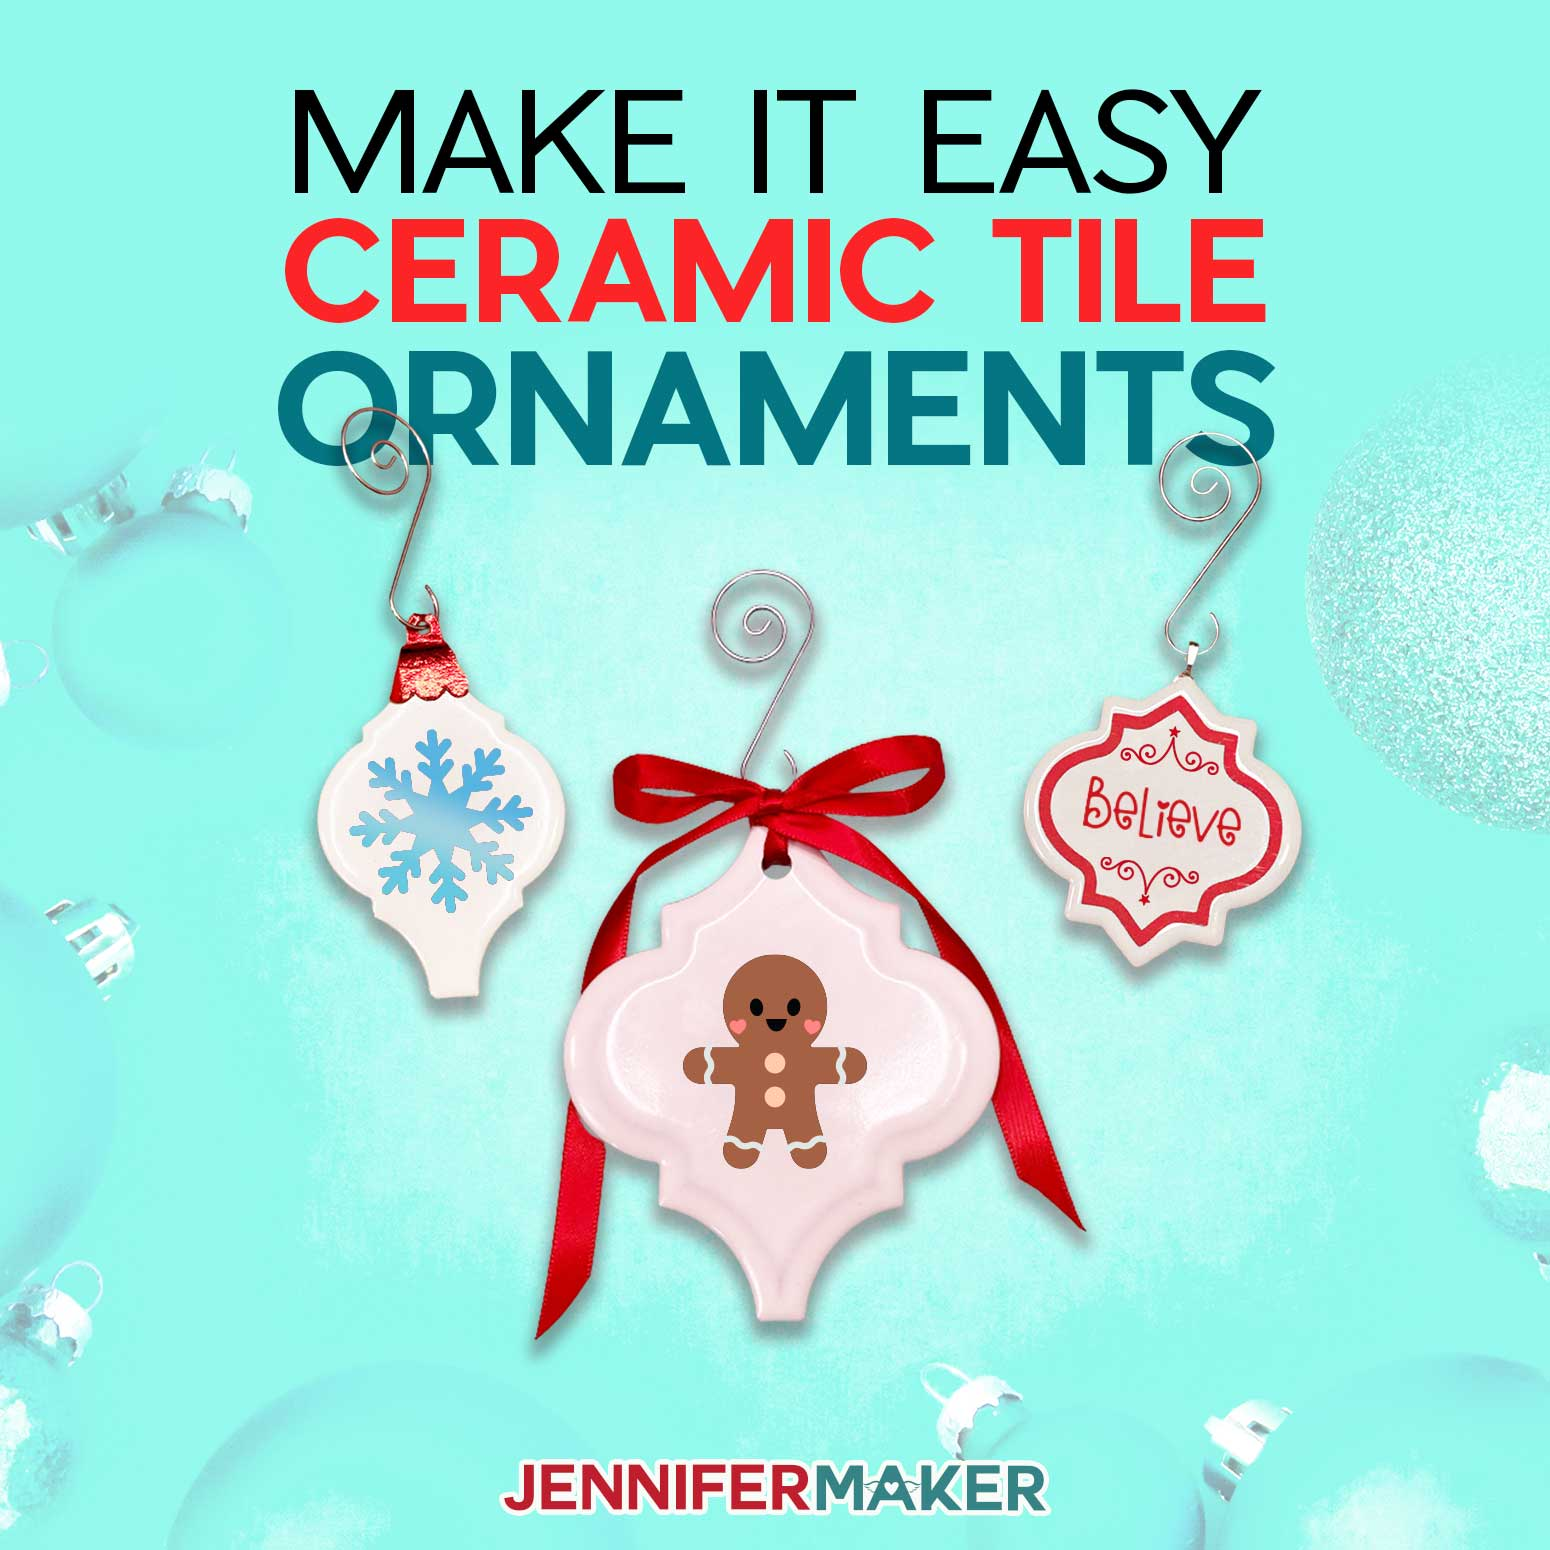 Diy Personalized Tile Ornaments Templates Designs Jennifer Maker